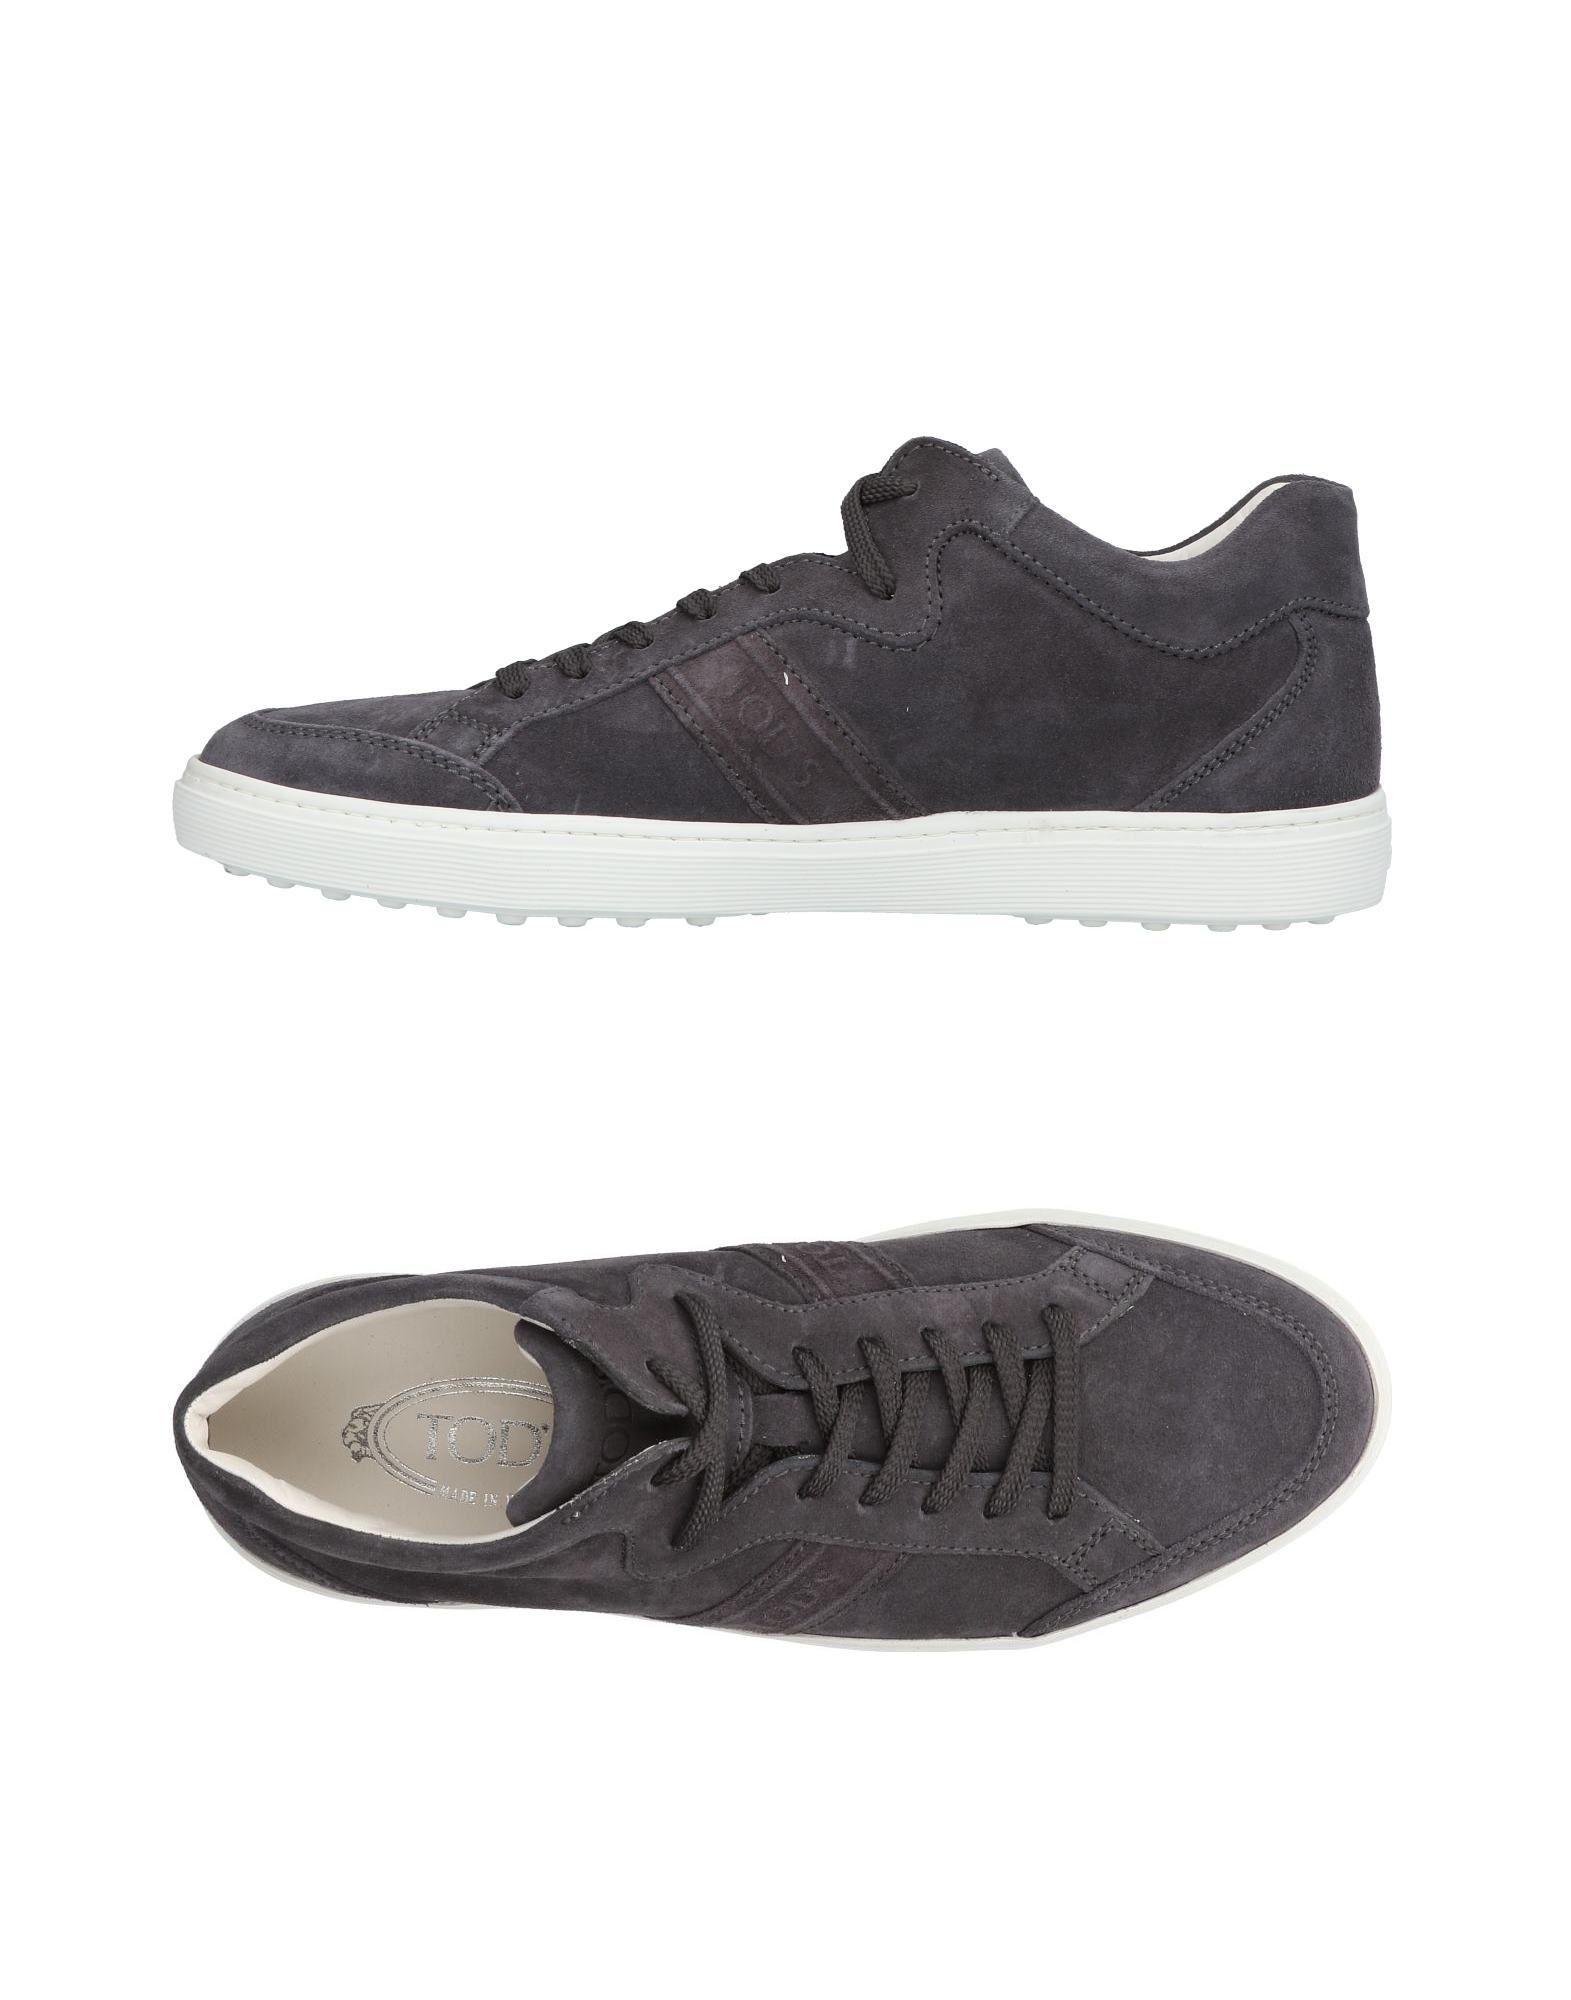 Tod's Sneakers Herren  11193439NQ Gute Qualität beliebte Schuhe